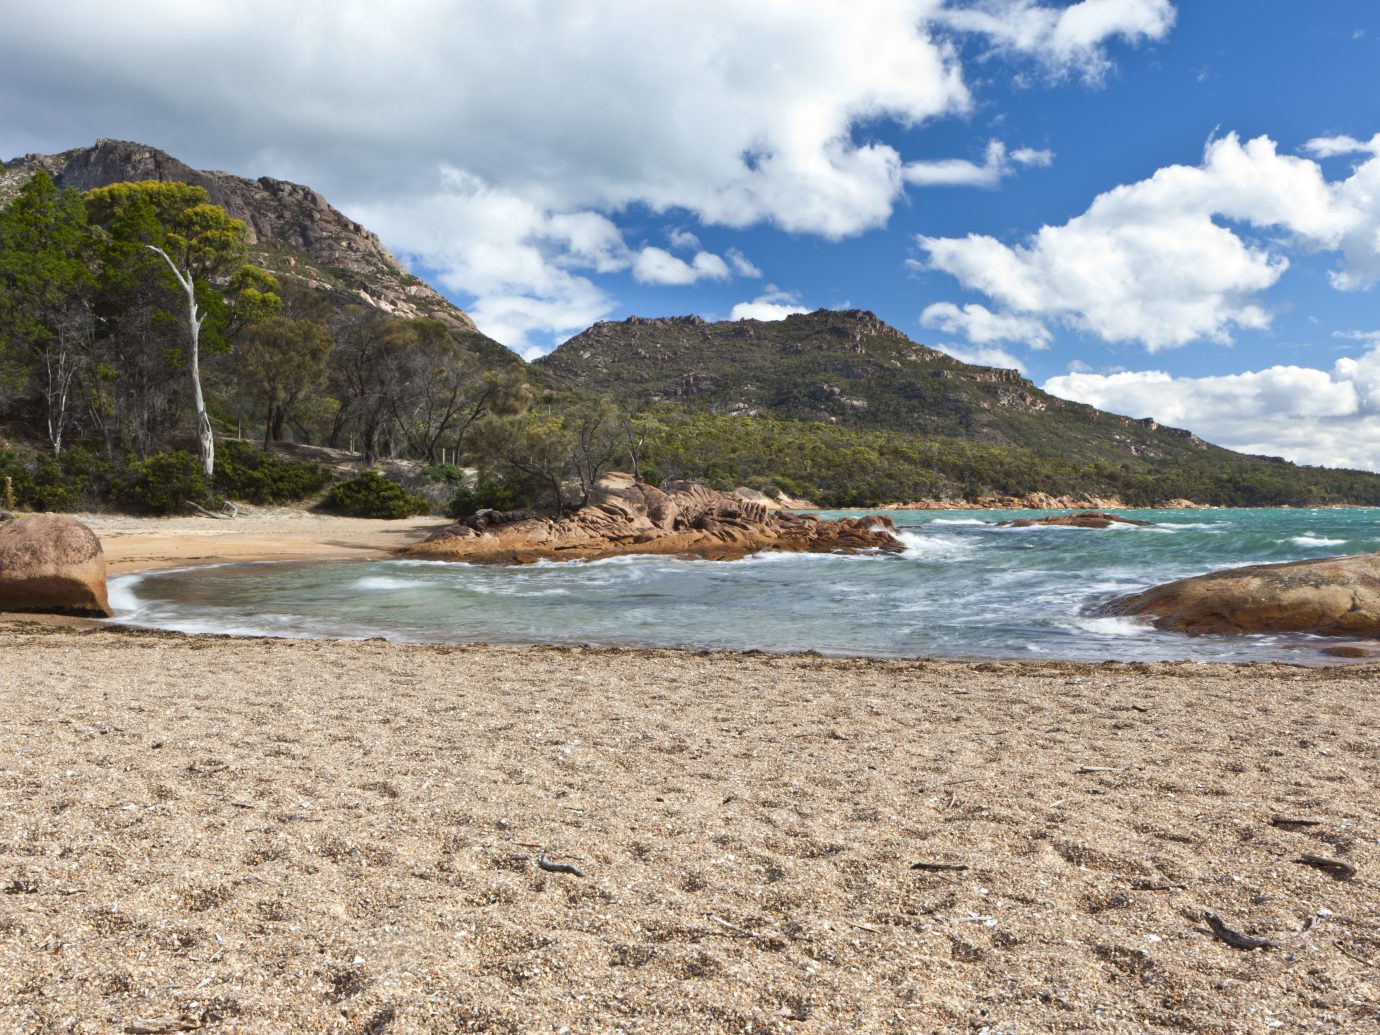 Honeymoon bay at Tasmania, Freycinet National Park. Australia